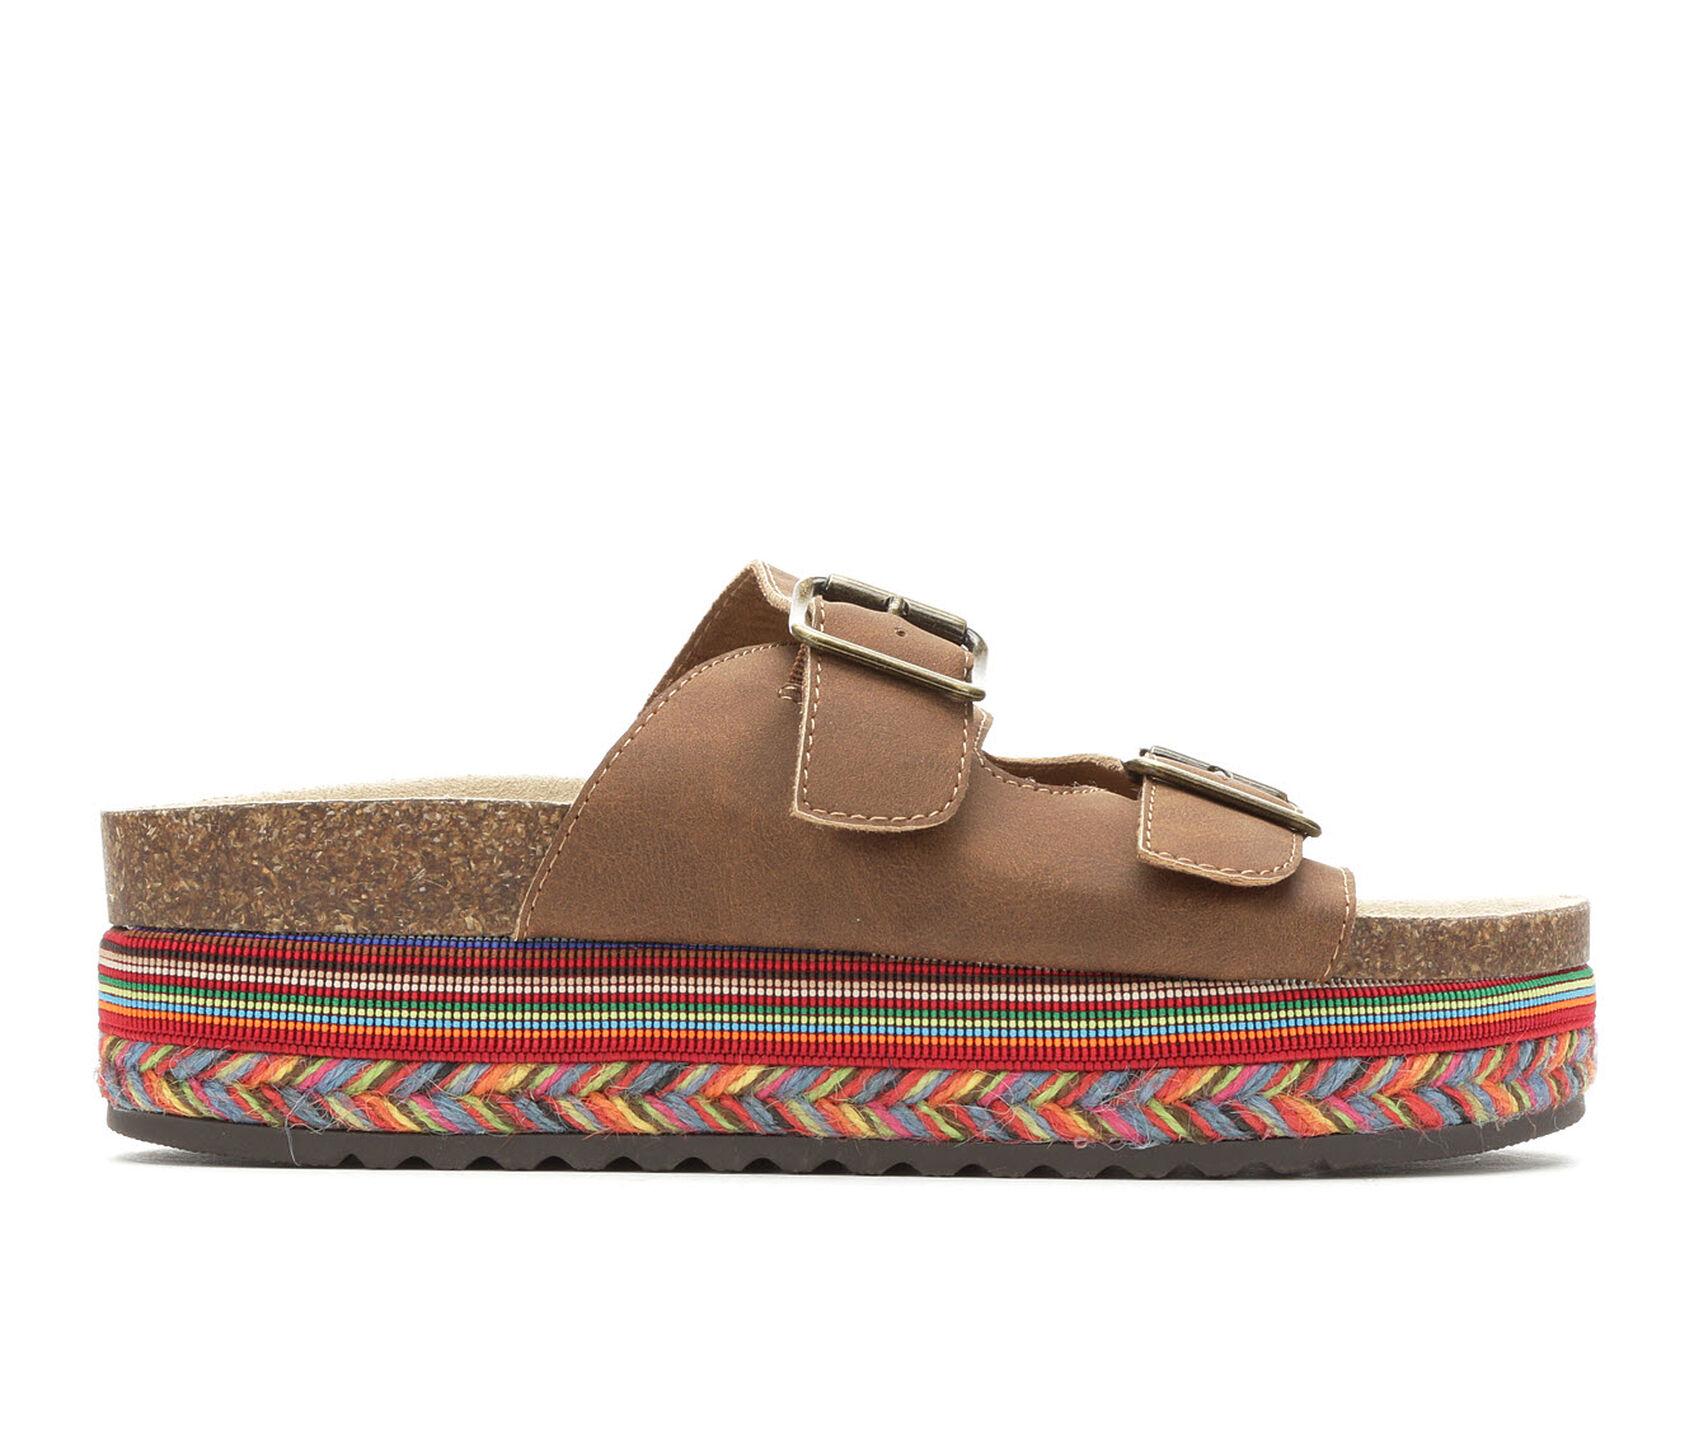 12c15deab472 Women s Seven Dials Beverlyn Footbed Flatform Sandals